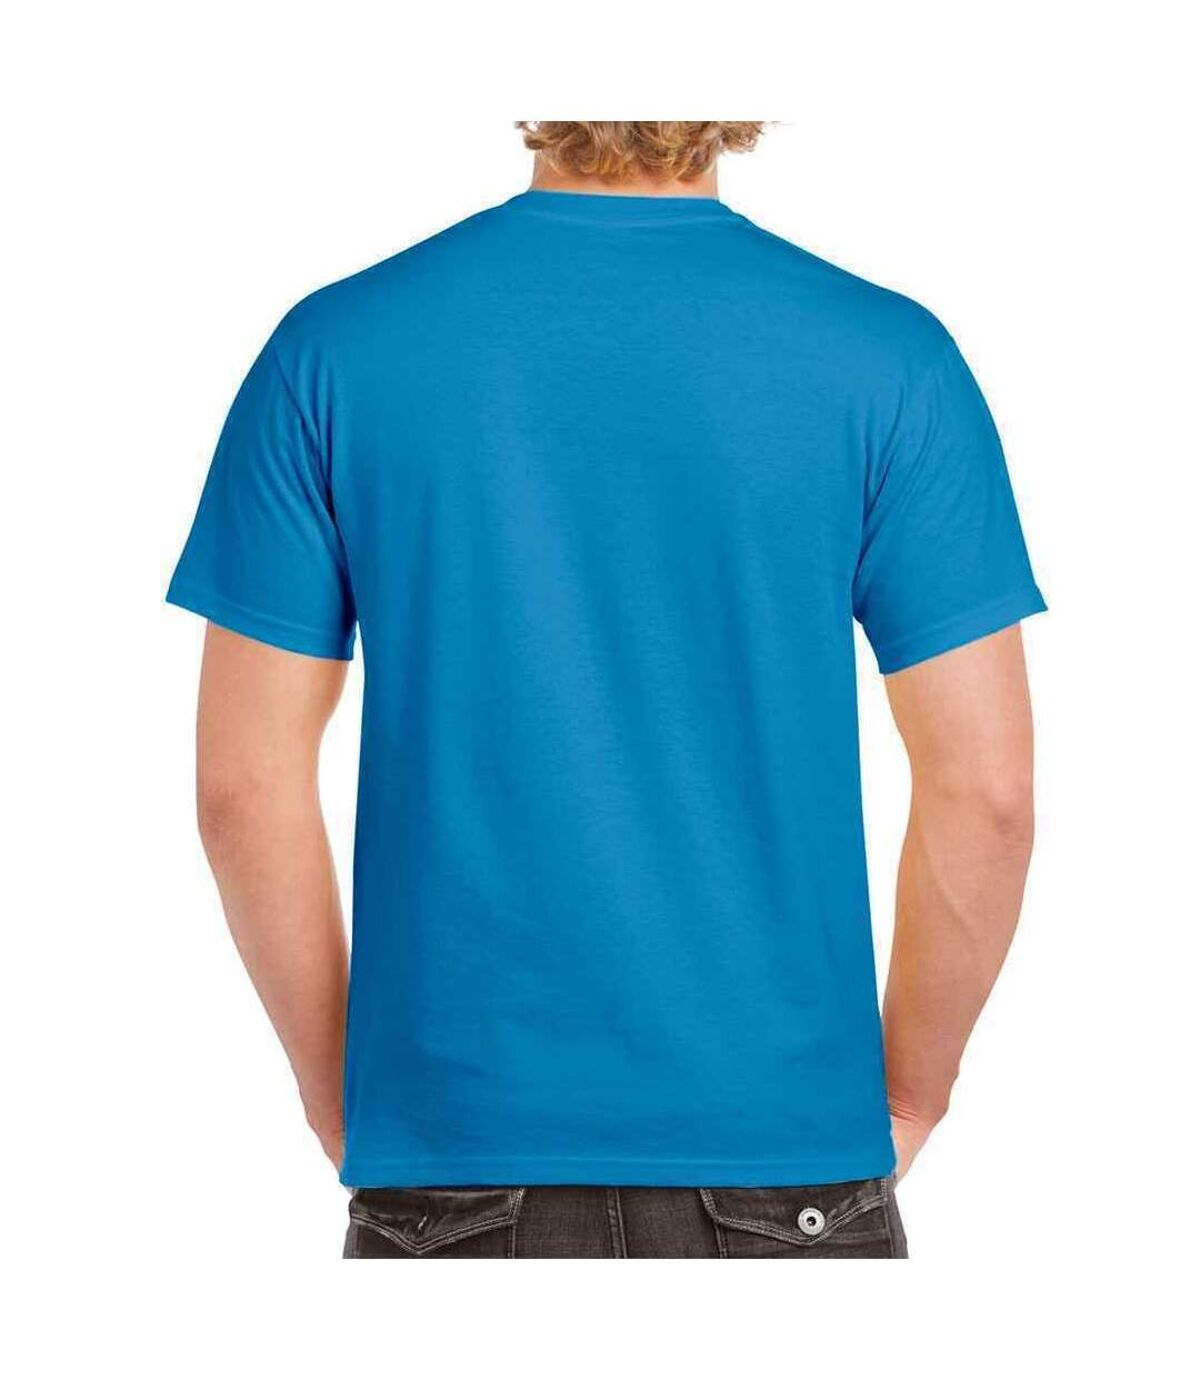 Gildan Mens Hammer Heavyweight T-Shirt (Iris) - UTPC3067